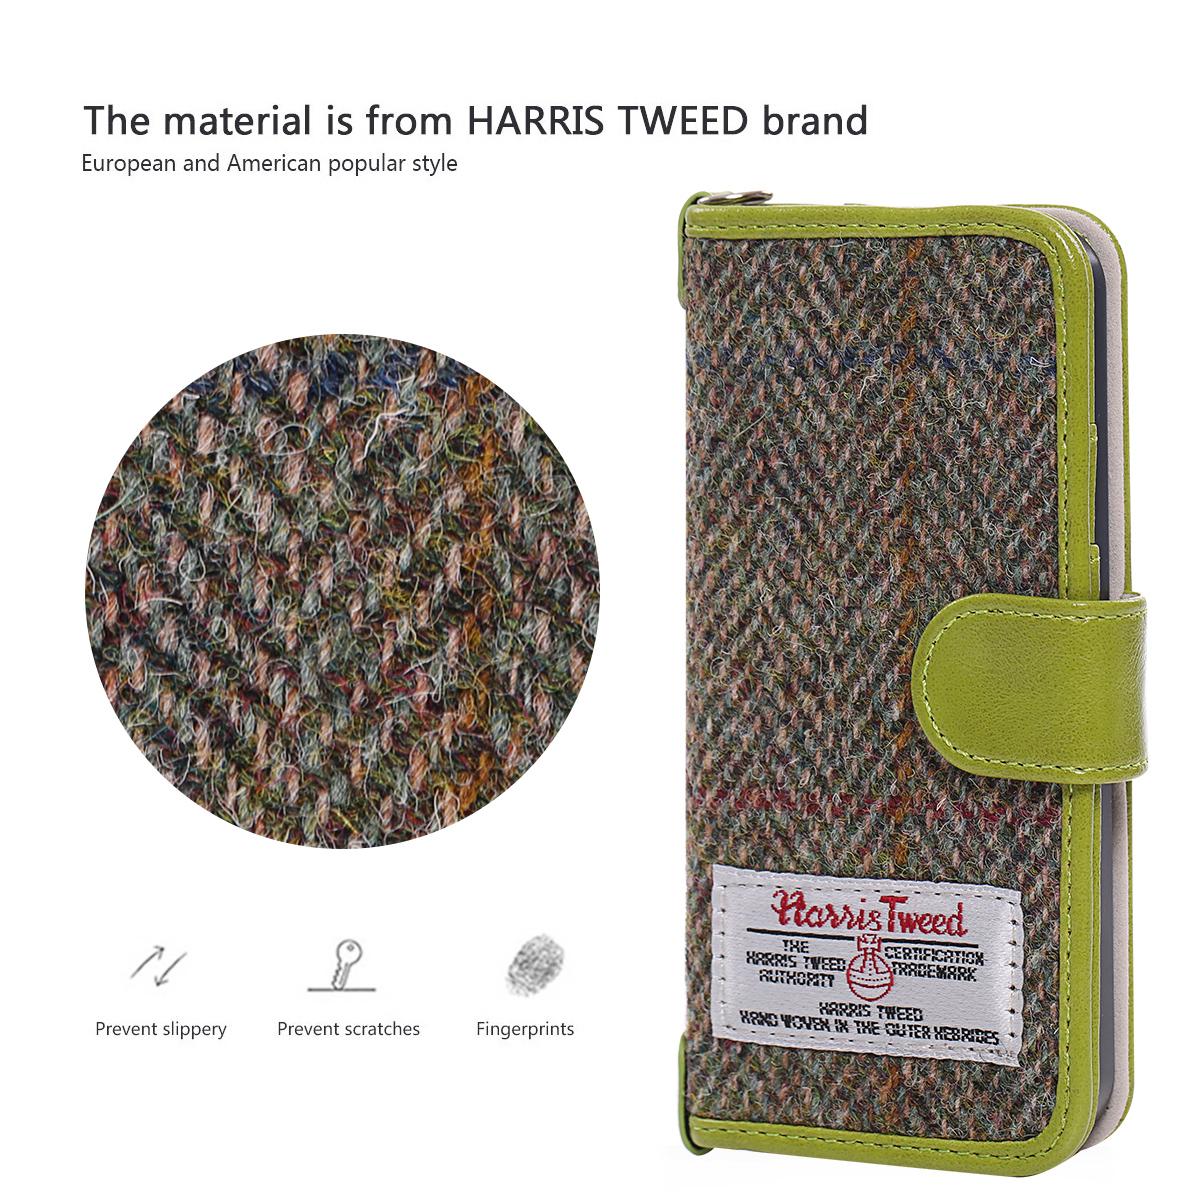 Harris Tweed Wallet Case,Non-Slip, Retro Magnetic Flip Cover Case for iPhone 5